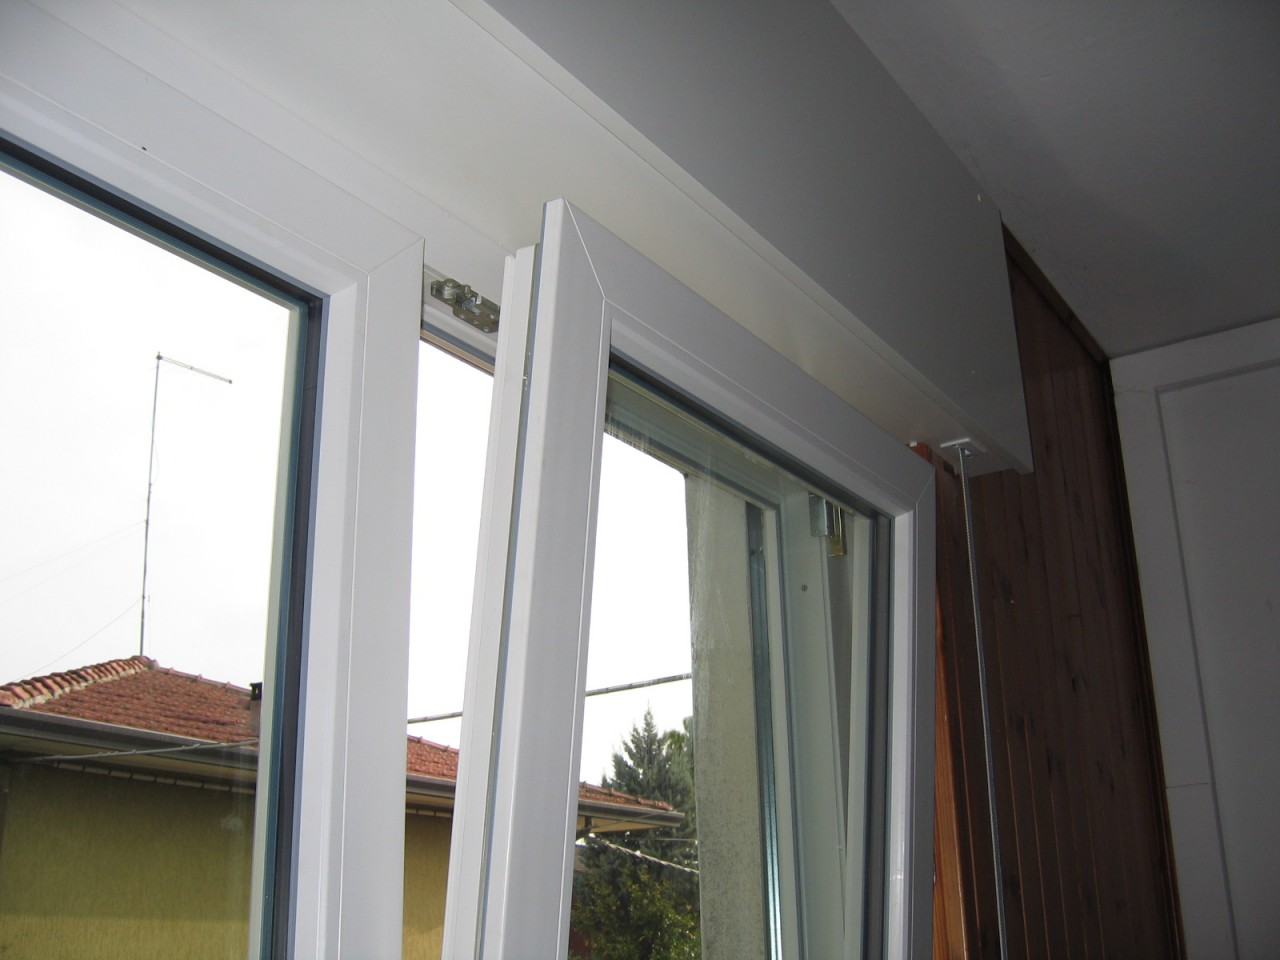 serramenti pvc finestre porte blindate portoncini